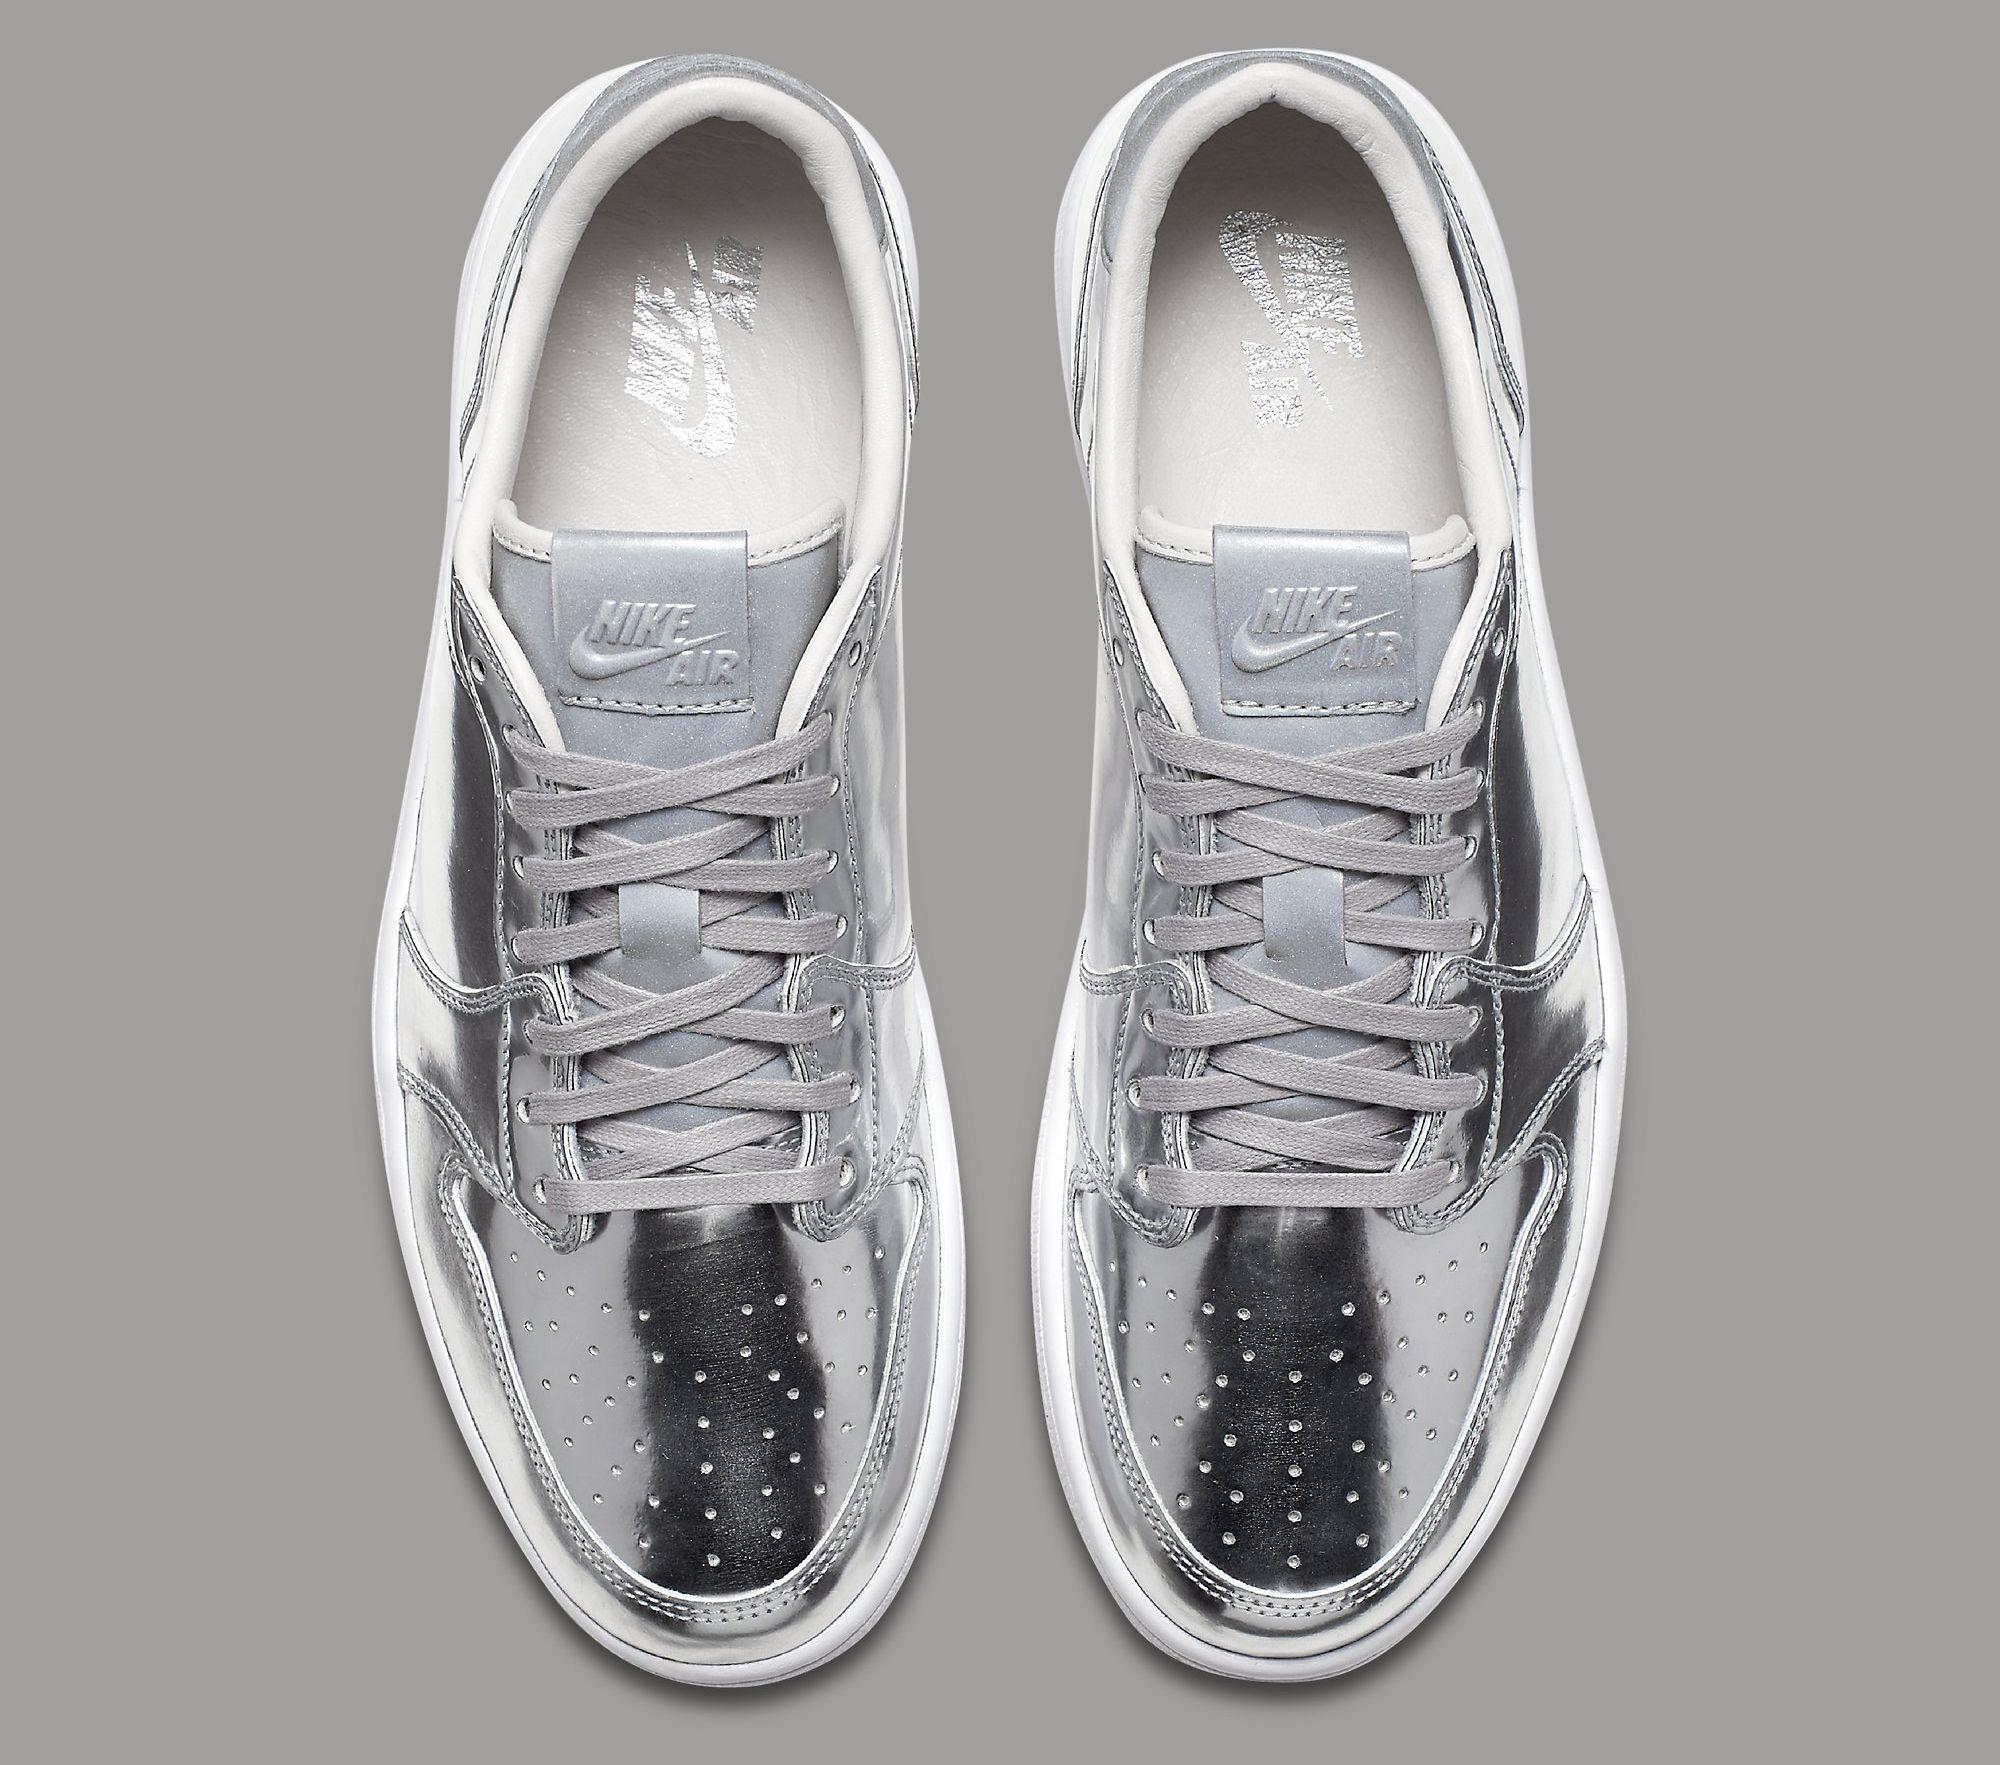 5fd4a475207 Pinnacle Air Jordan 1 Low Silver Release Date | Sole Collector ...